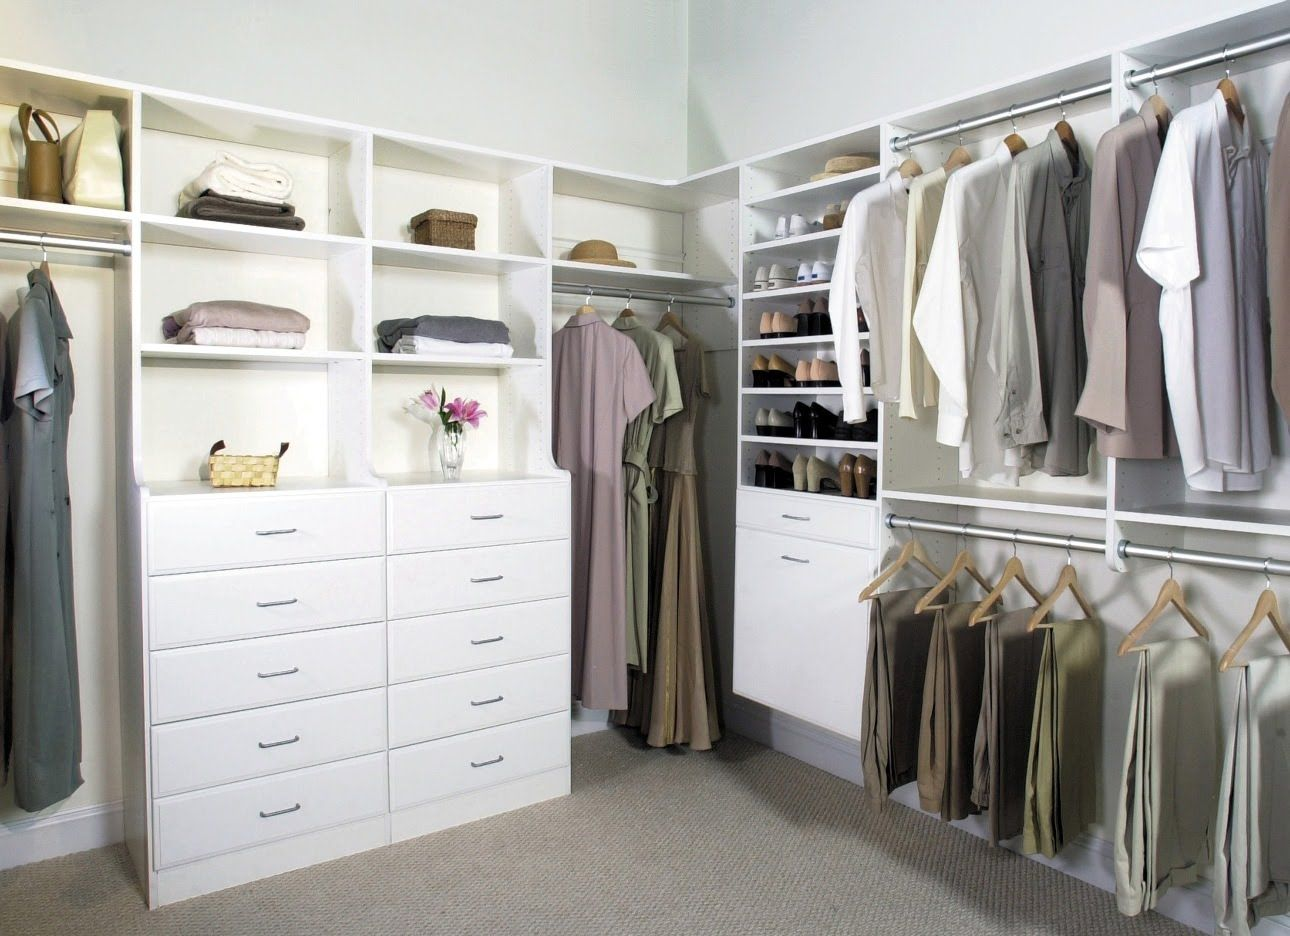 accesorios interiores armarios   Armarios empotrados 2017 ...